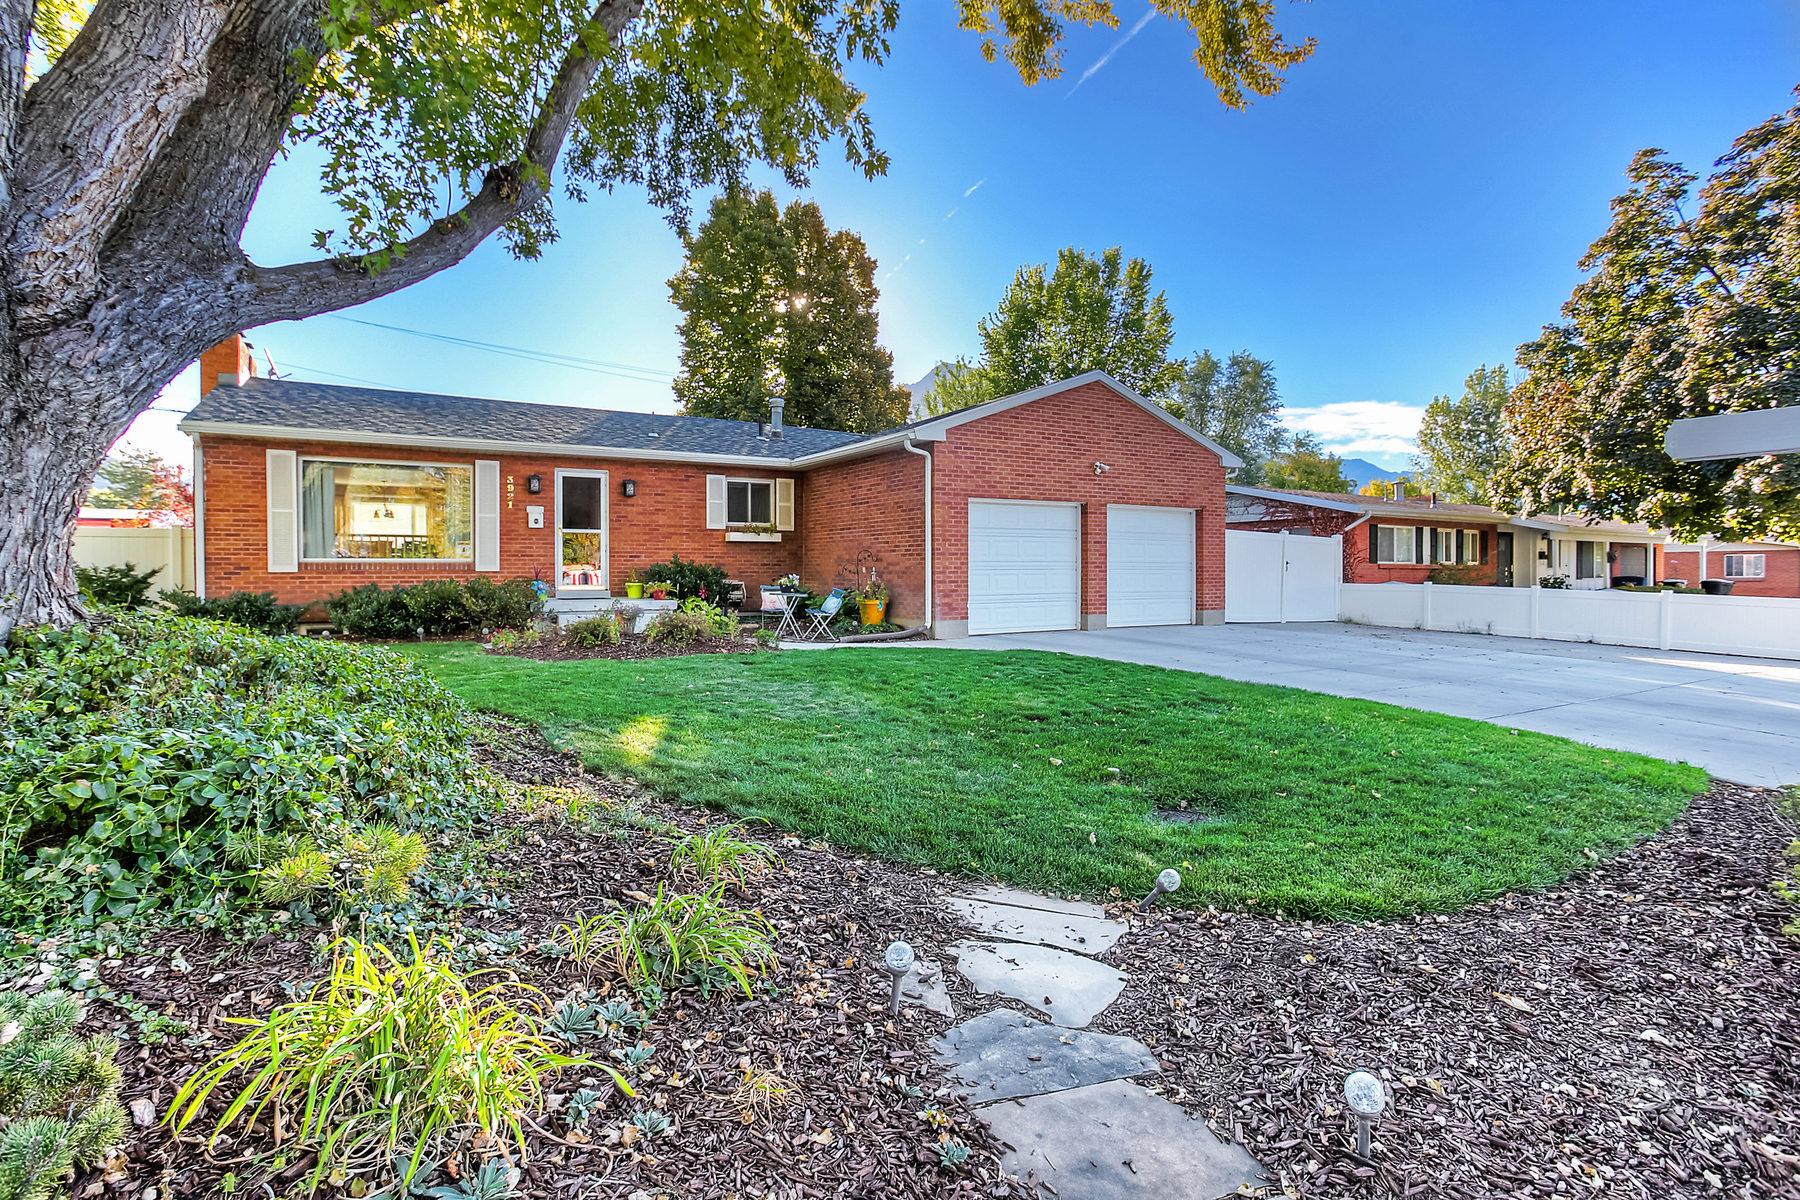 Maison unifamiliale pour l Vente à Beautiful all Brick Rambler in Holladay! 3921 S Alberly Way Holladay, Utah 84124 États-Unis